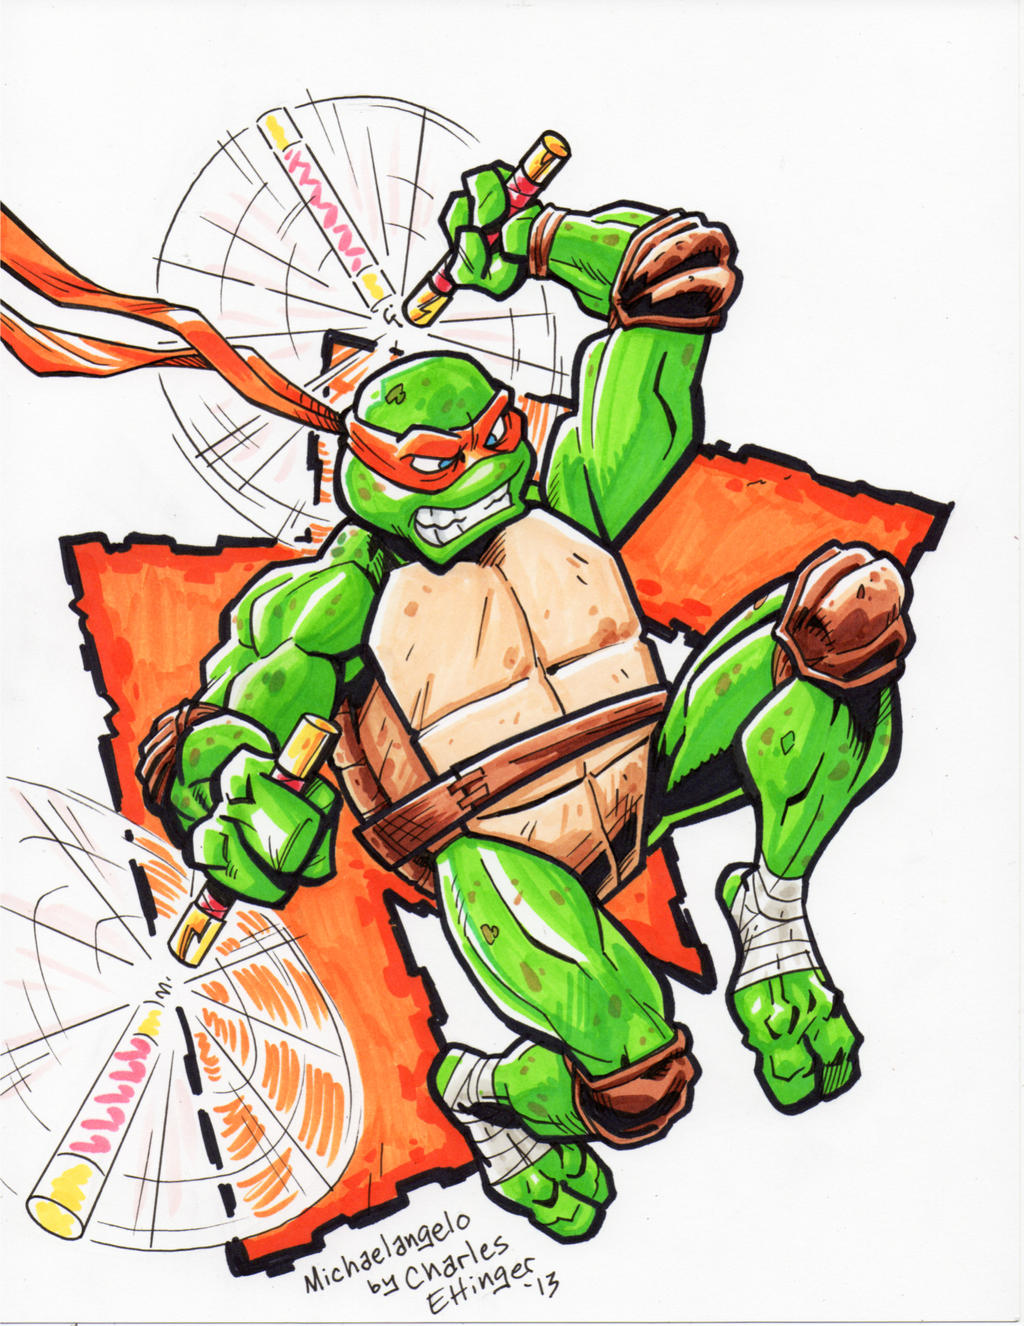 Ninja turtles michelangelo - photo#18